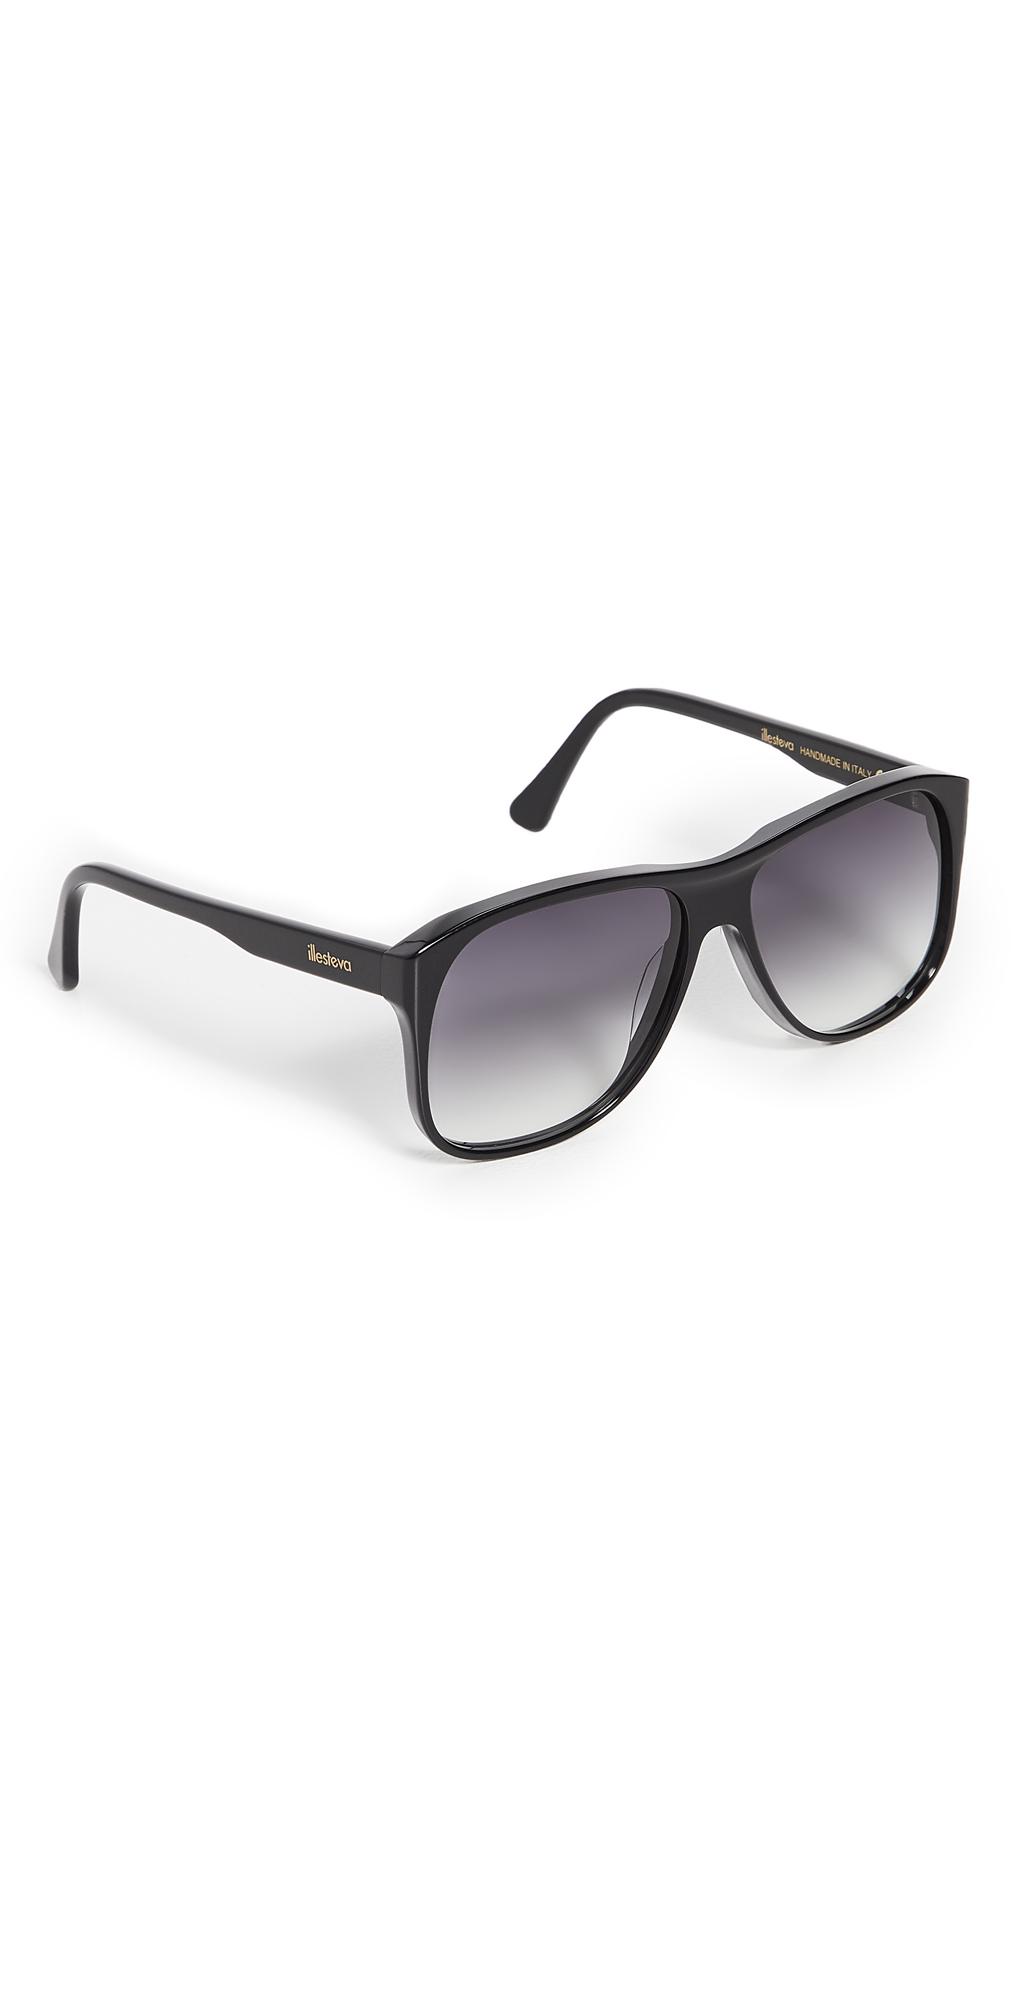 Dionne Black Sunglasses